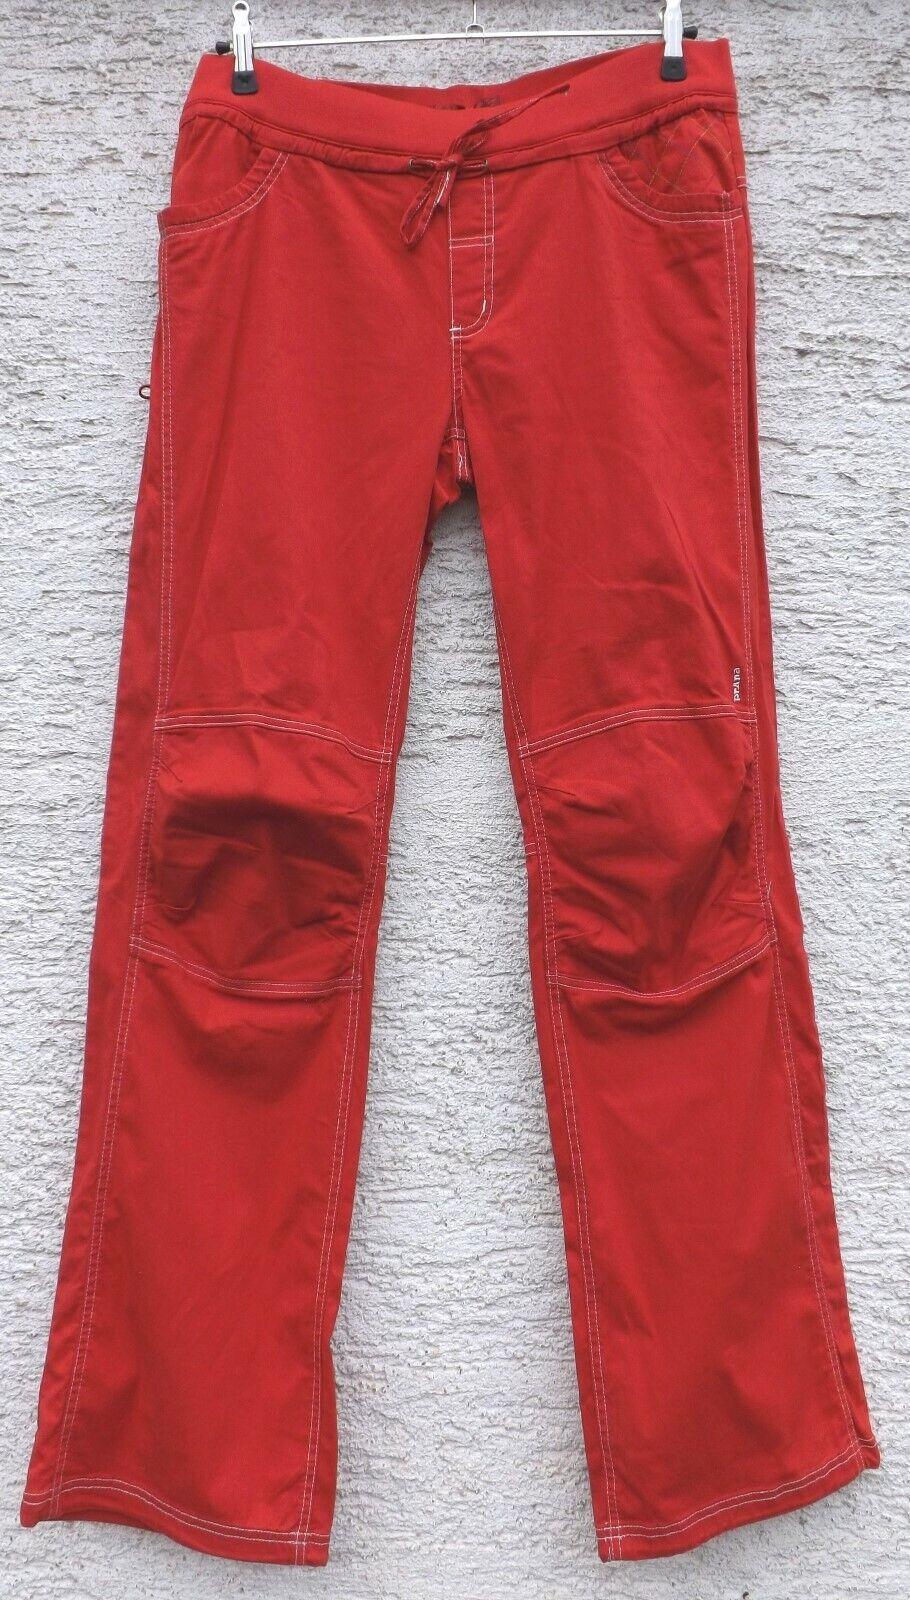 Prana Avril Pant   Kletterhose für Damen   rot ribbon  Boulderhose  Größe XL